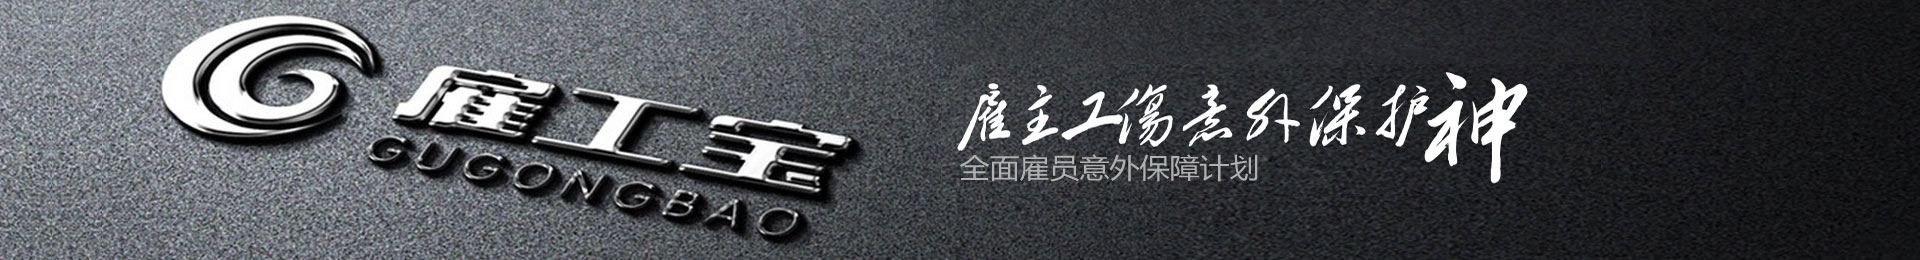 newbee赞助雷竞技雇工宝